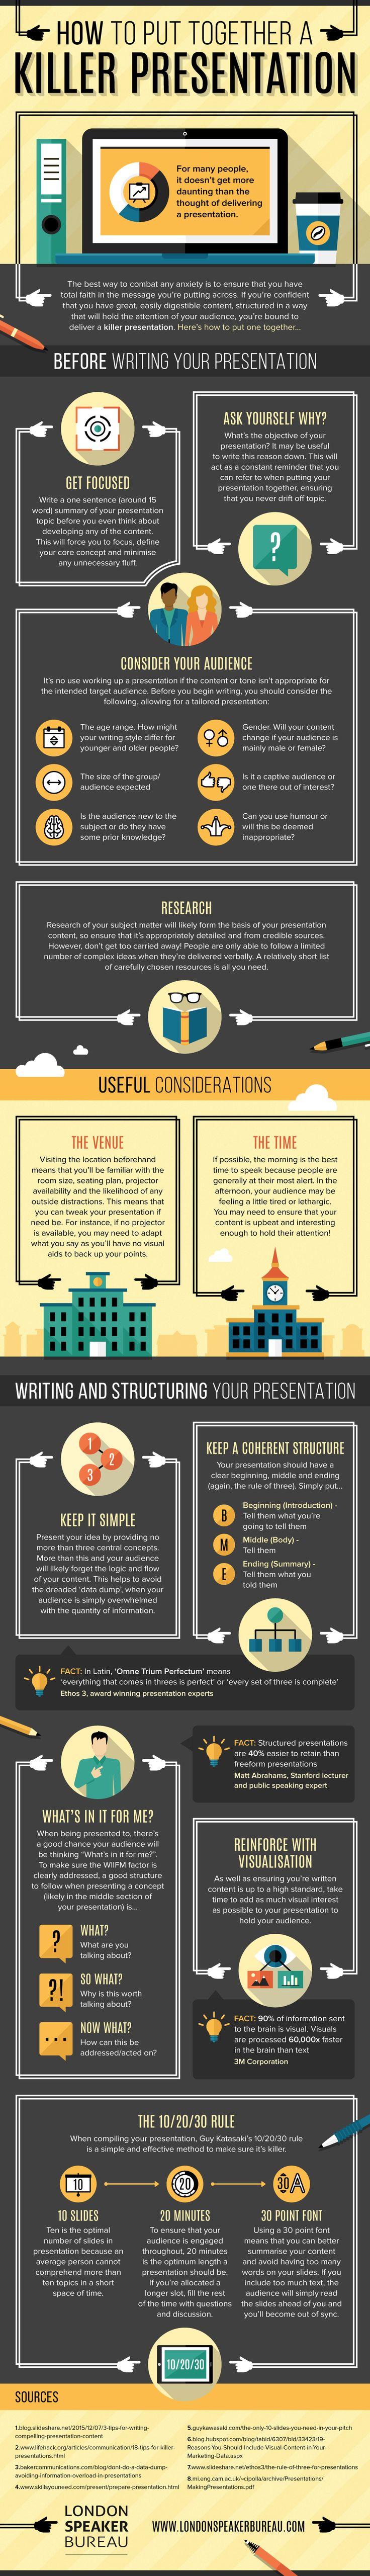 FREE Public Speaking Tips